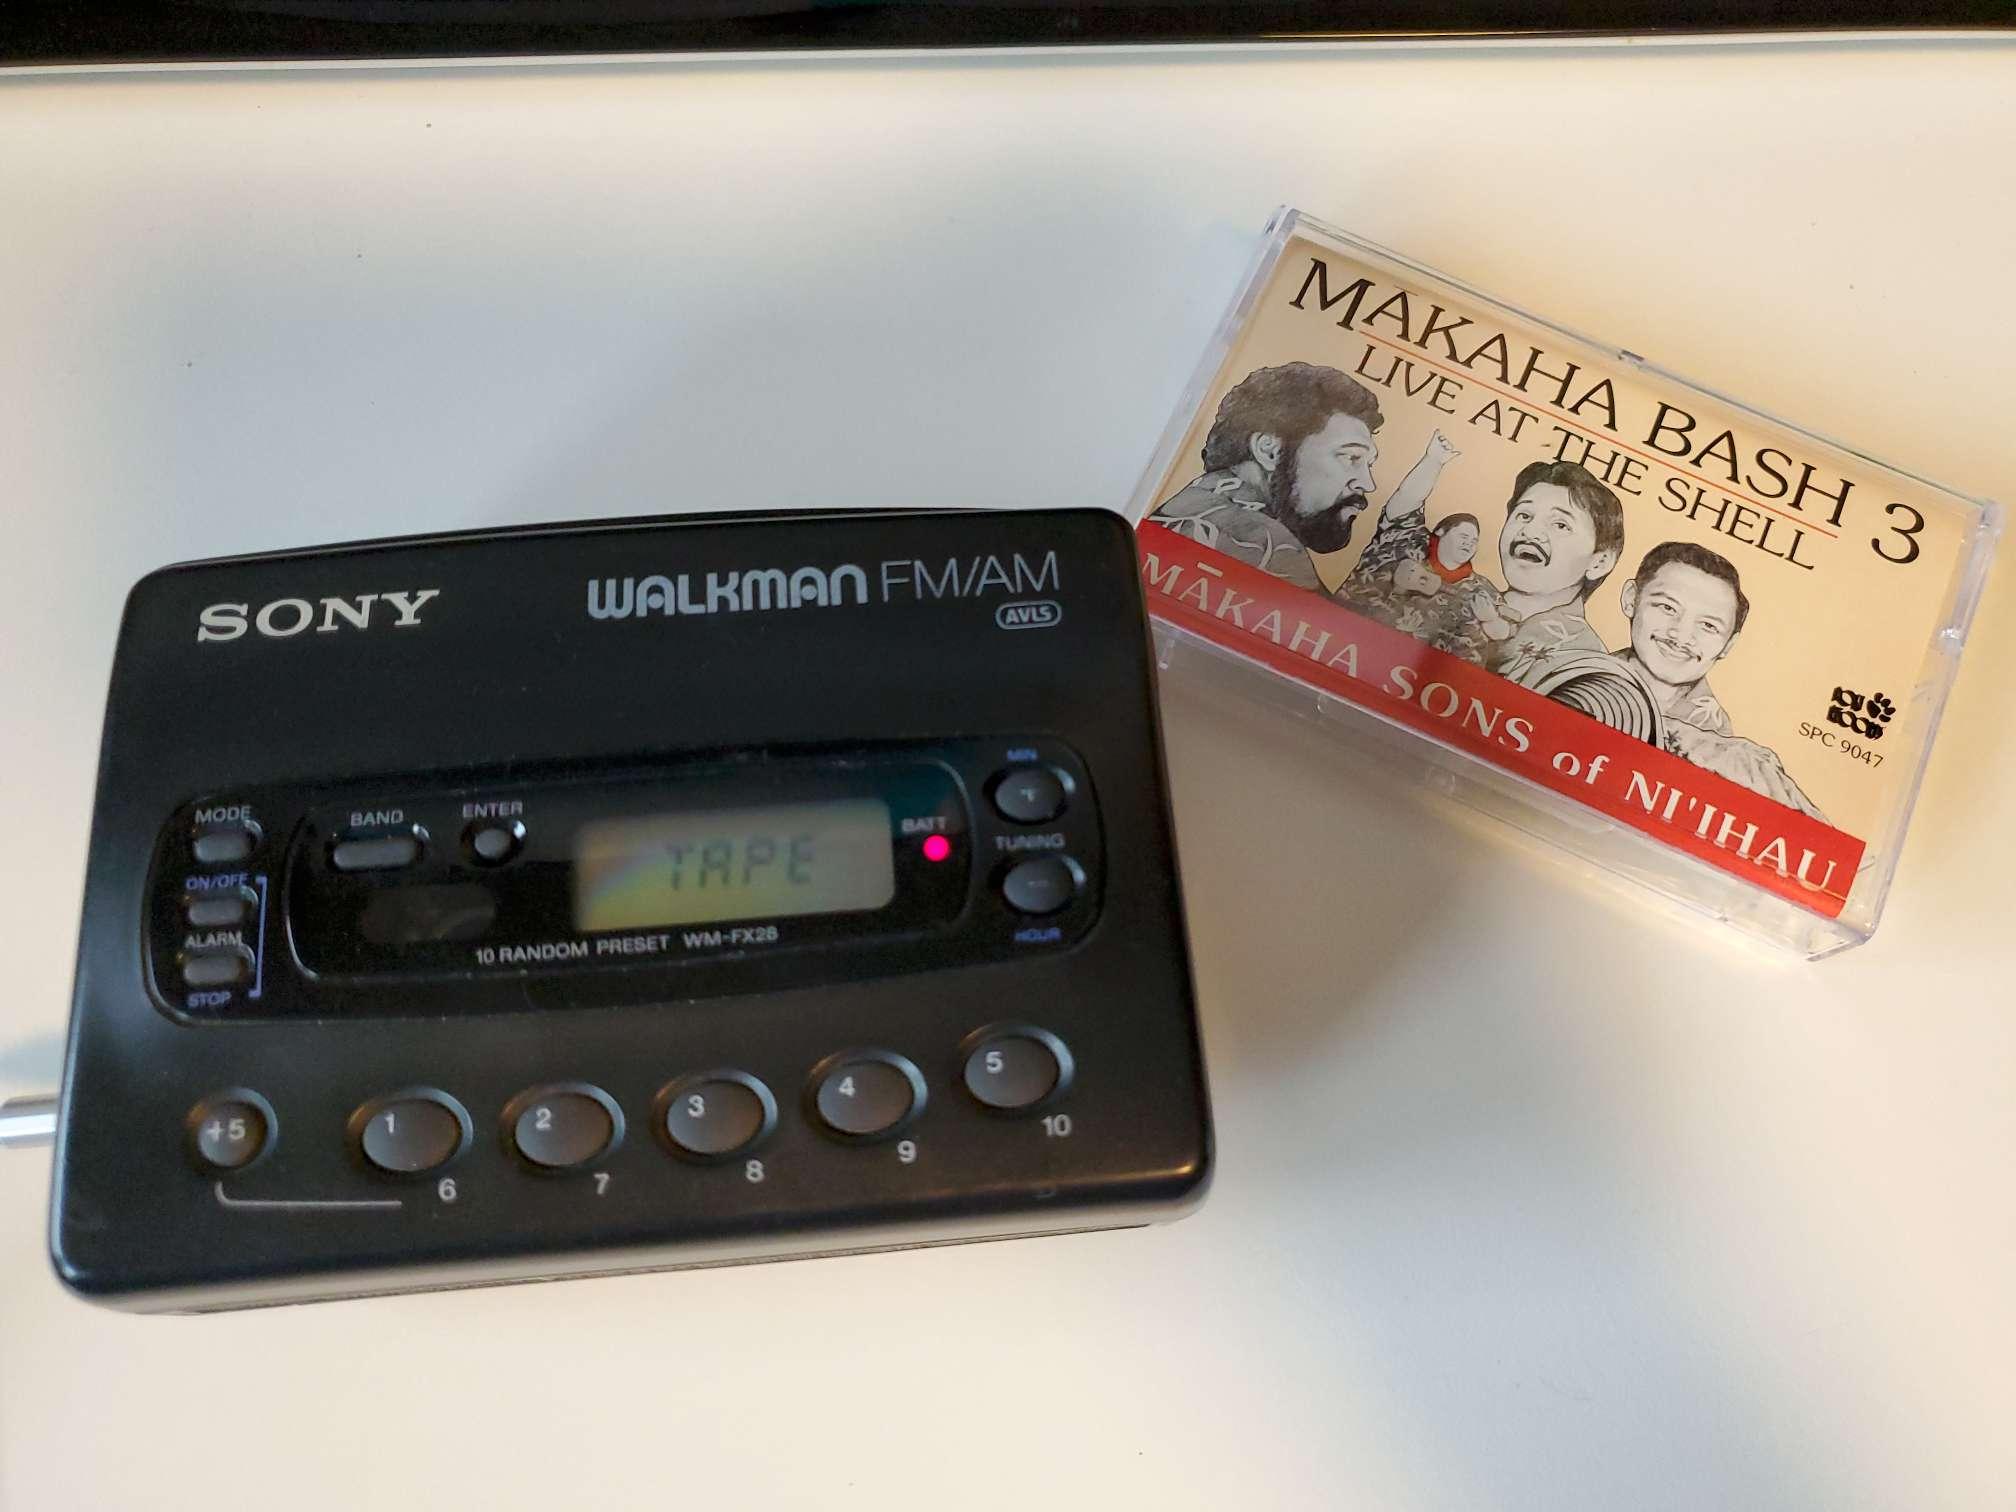 Sony Walkman WM-FX28 Repair Complete